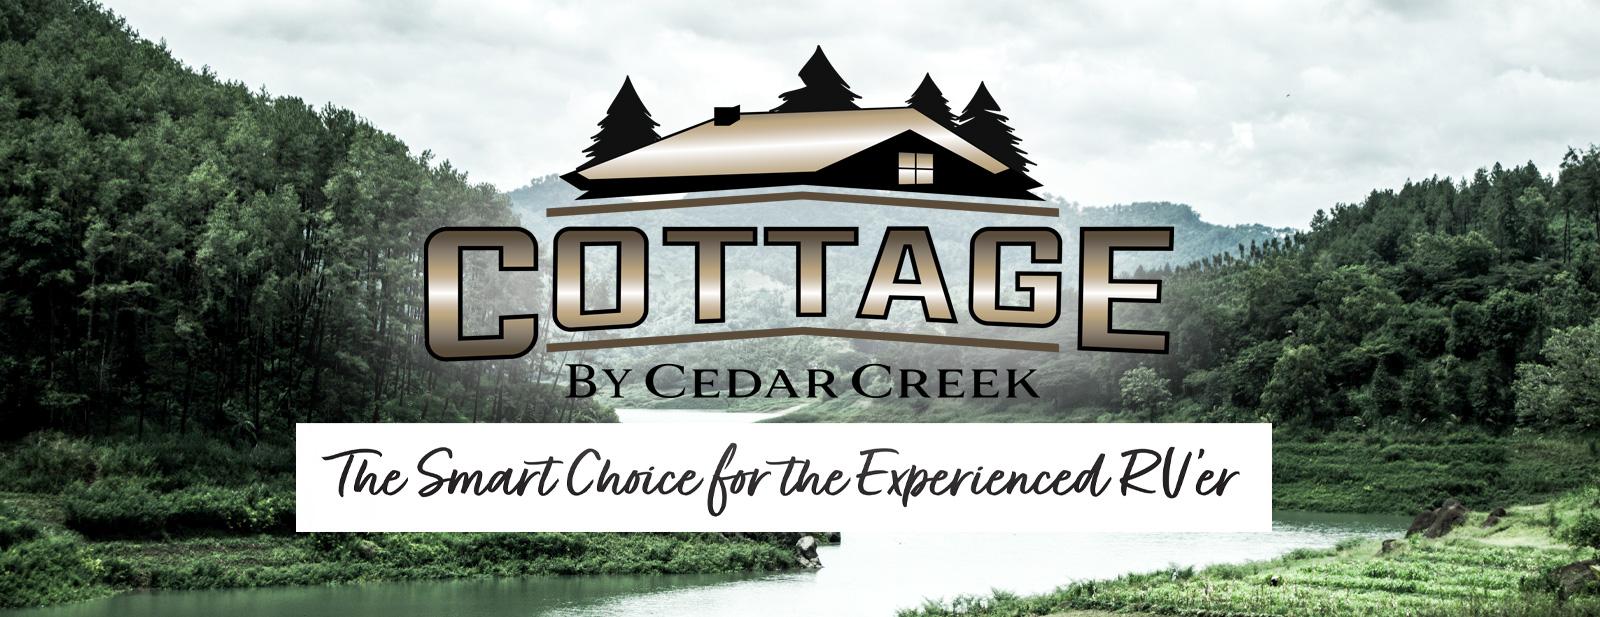 CEDAR CREEK COTTAGE Park Model Logo